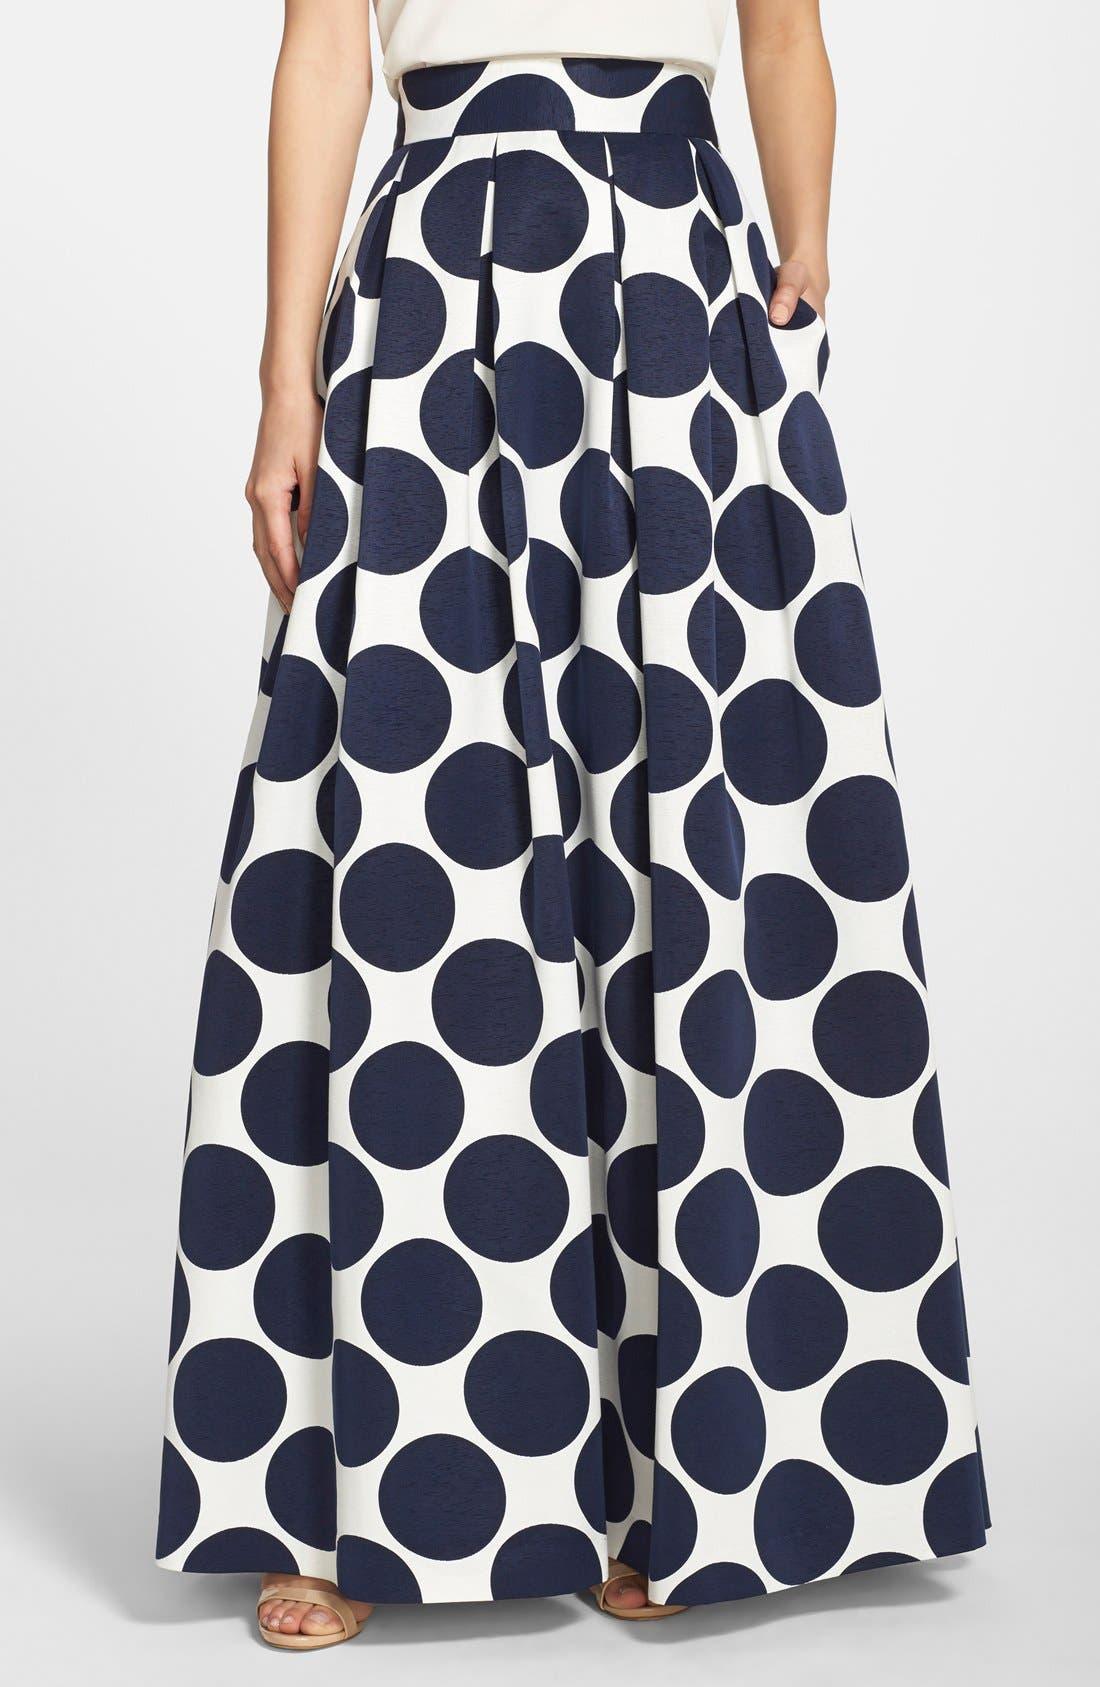 Pleated Dot Print Ball Skirt,                         Main,                         color, 407